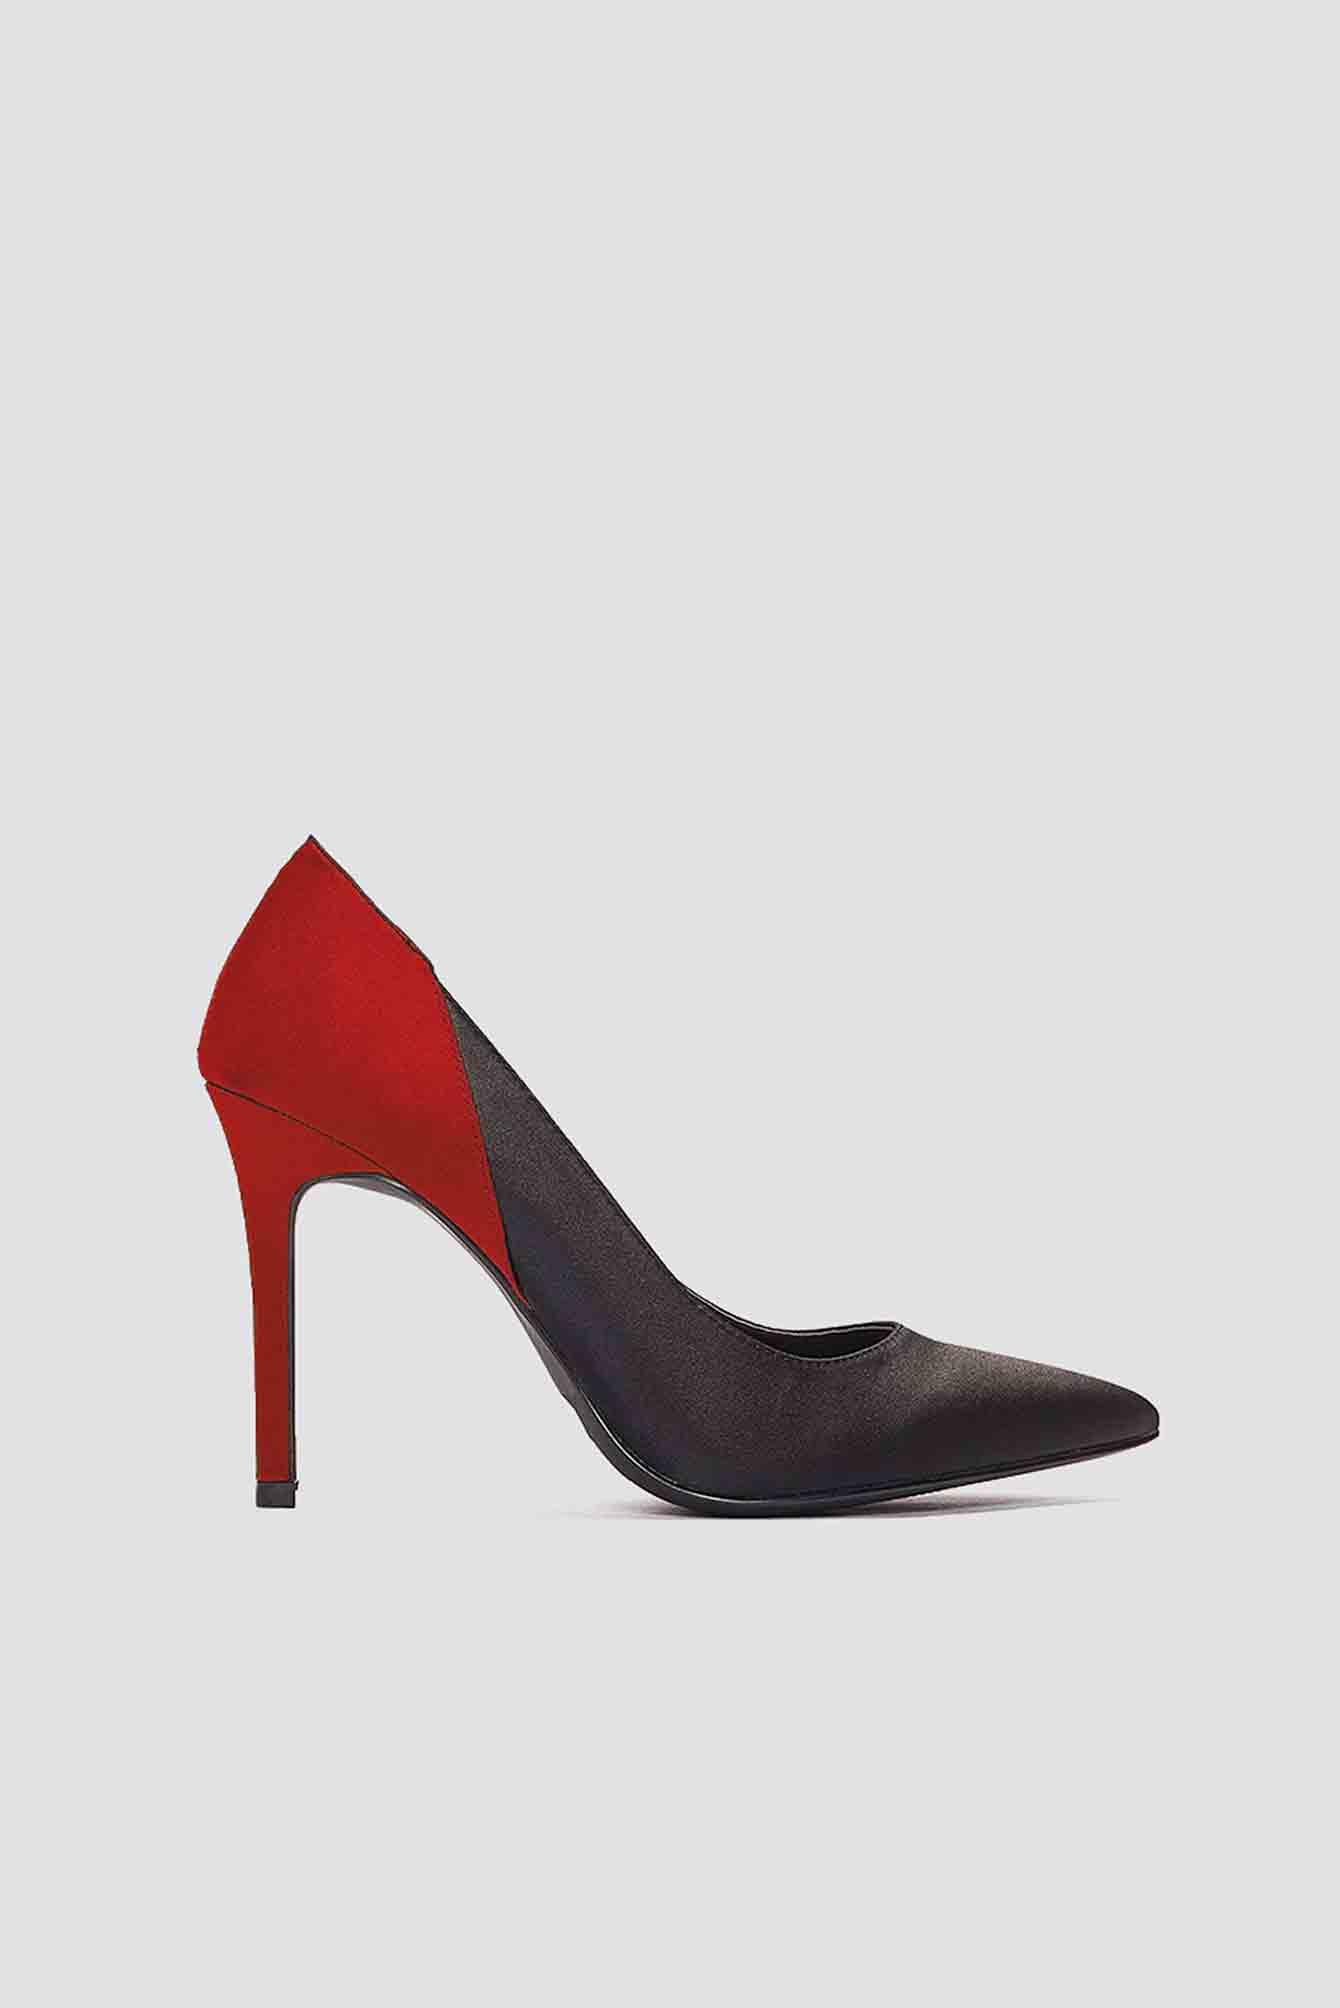 na-kd shoes -  Block Color Satin Pumps - Black,Red,Multicolor